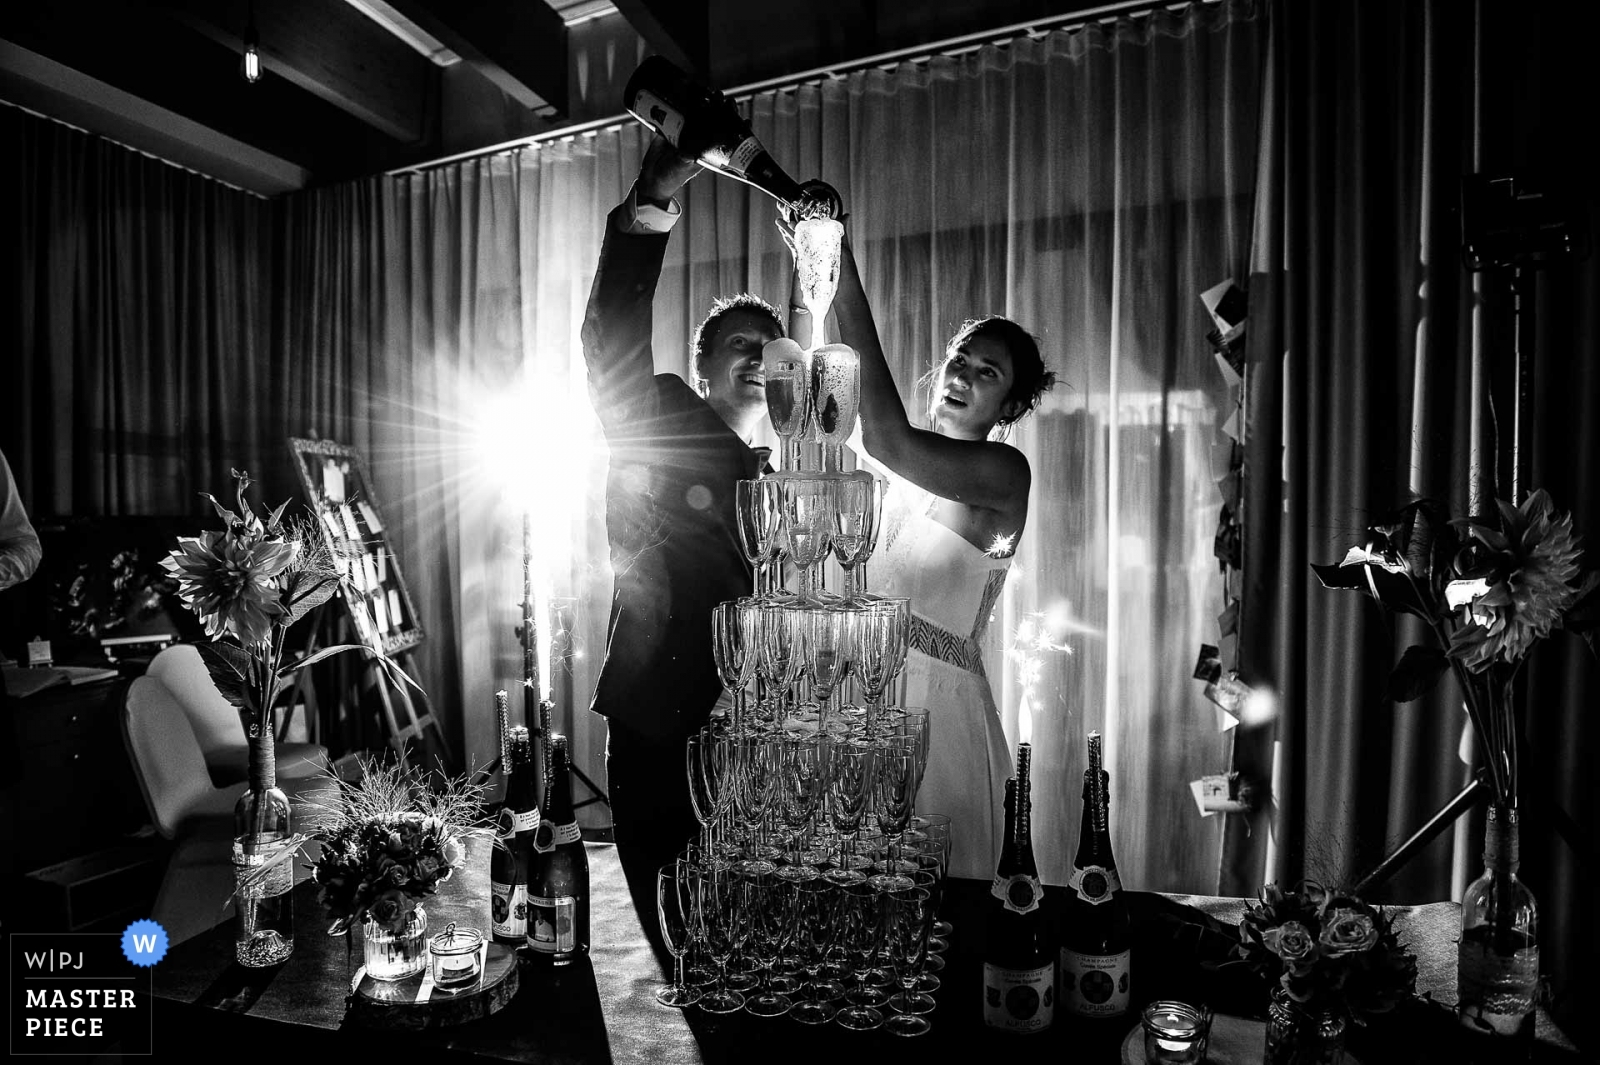 the cutting of the cake - Melbourne, Victoria, Australia Wedding Photography -  | Hotel de la mer, Brignogan Plage, France